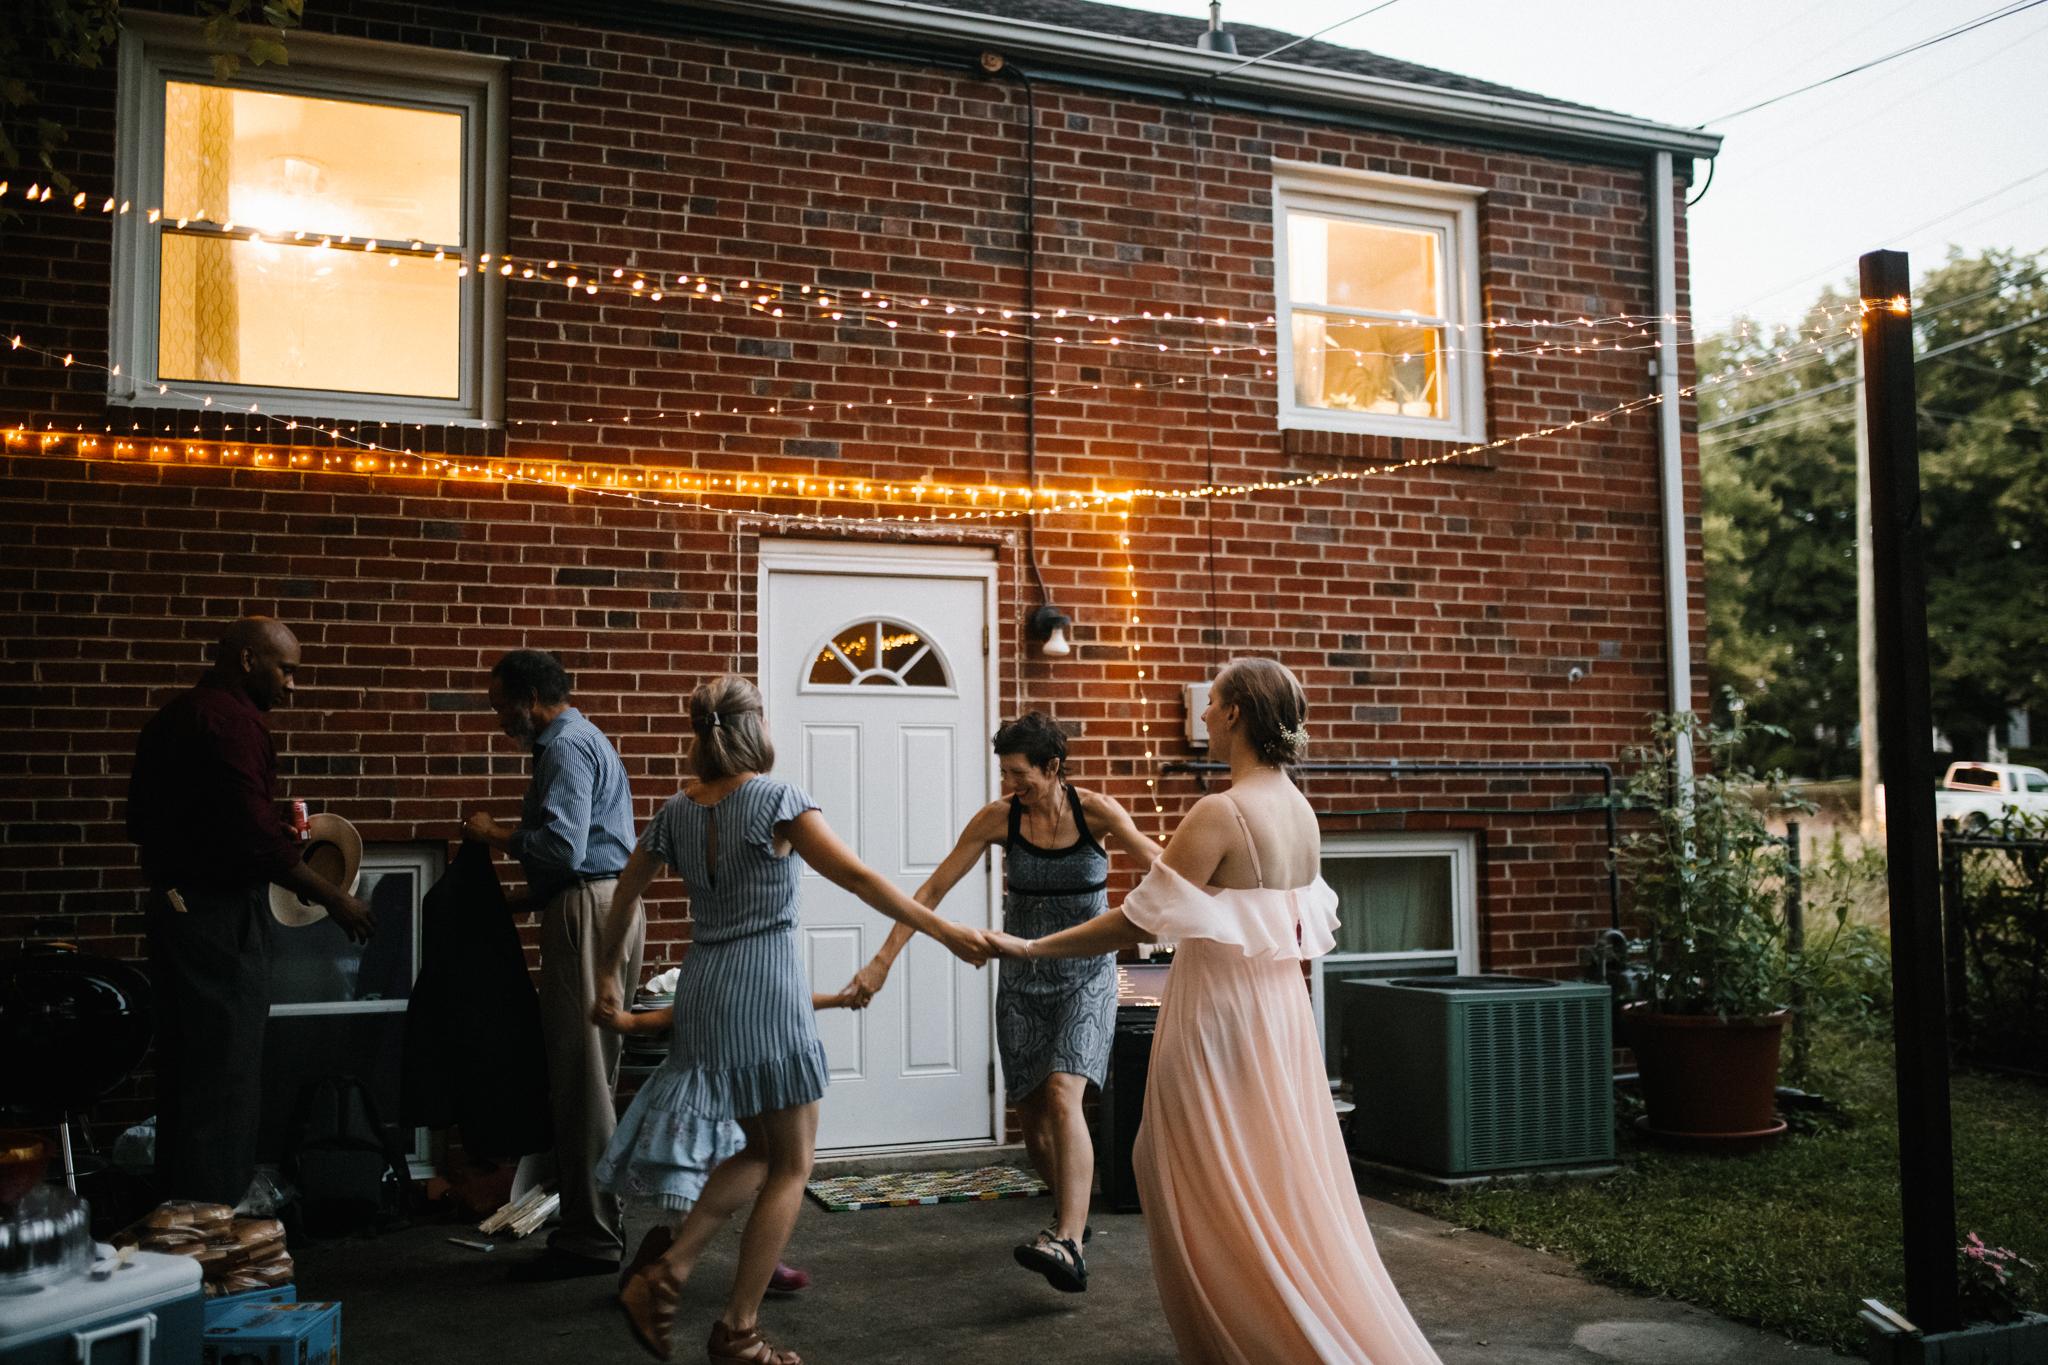 dorota_dwight_richmond_backyard_wedding-111.jpg